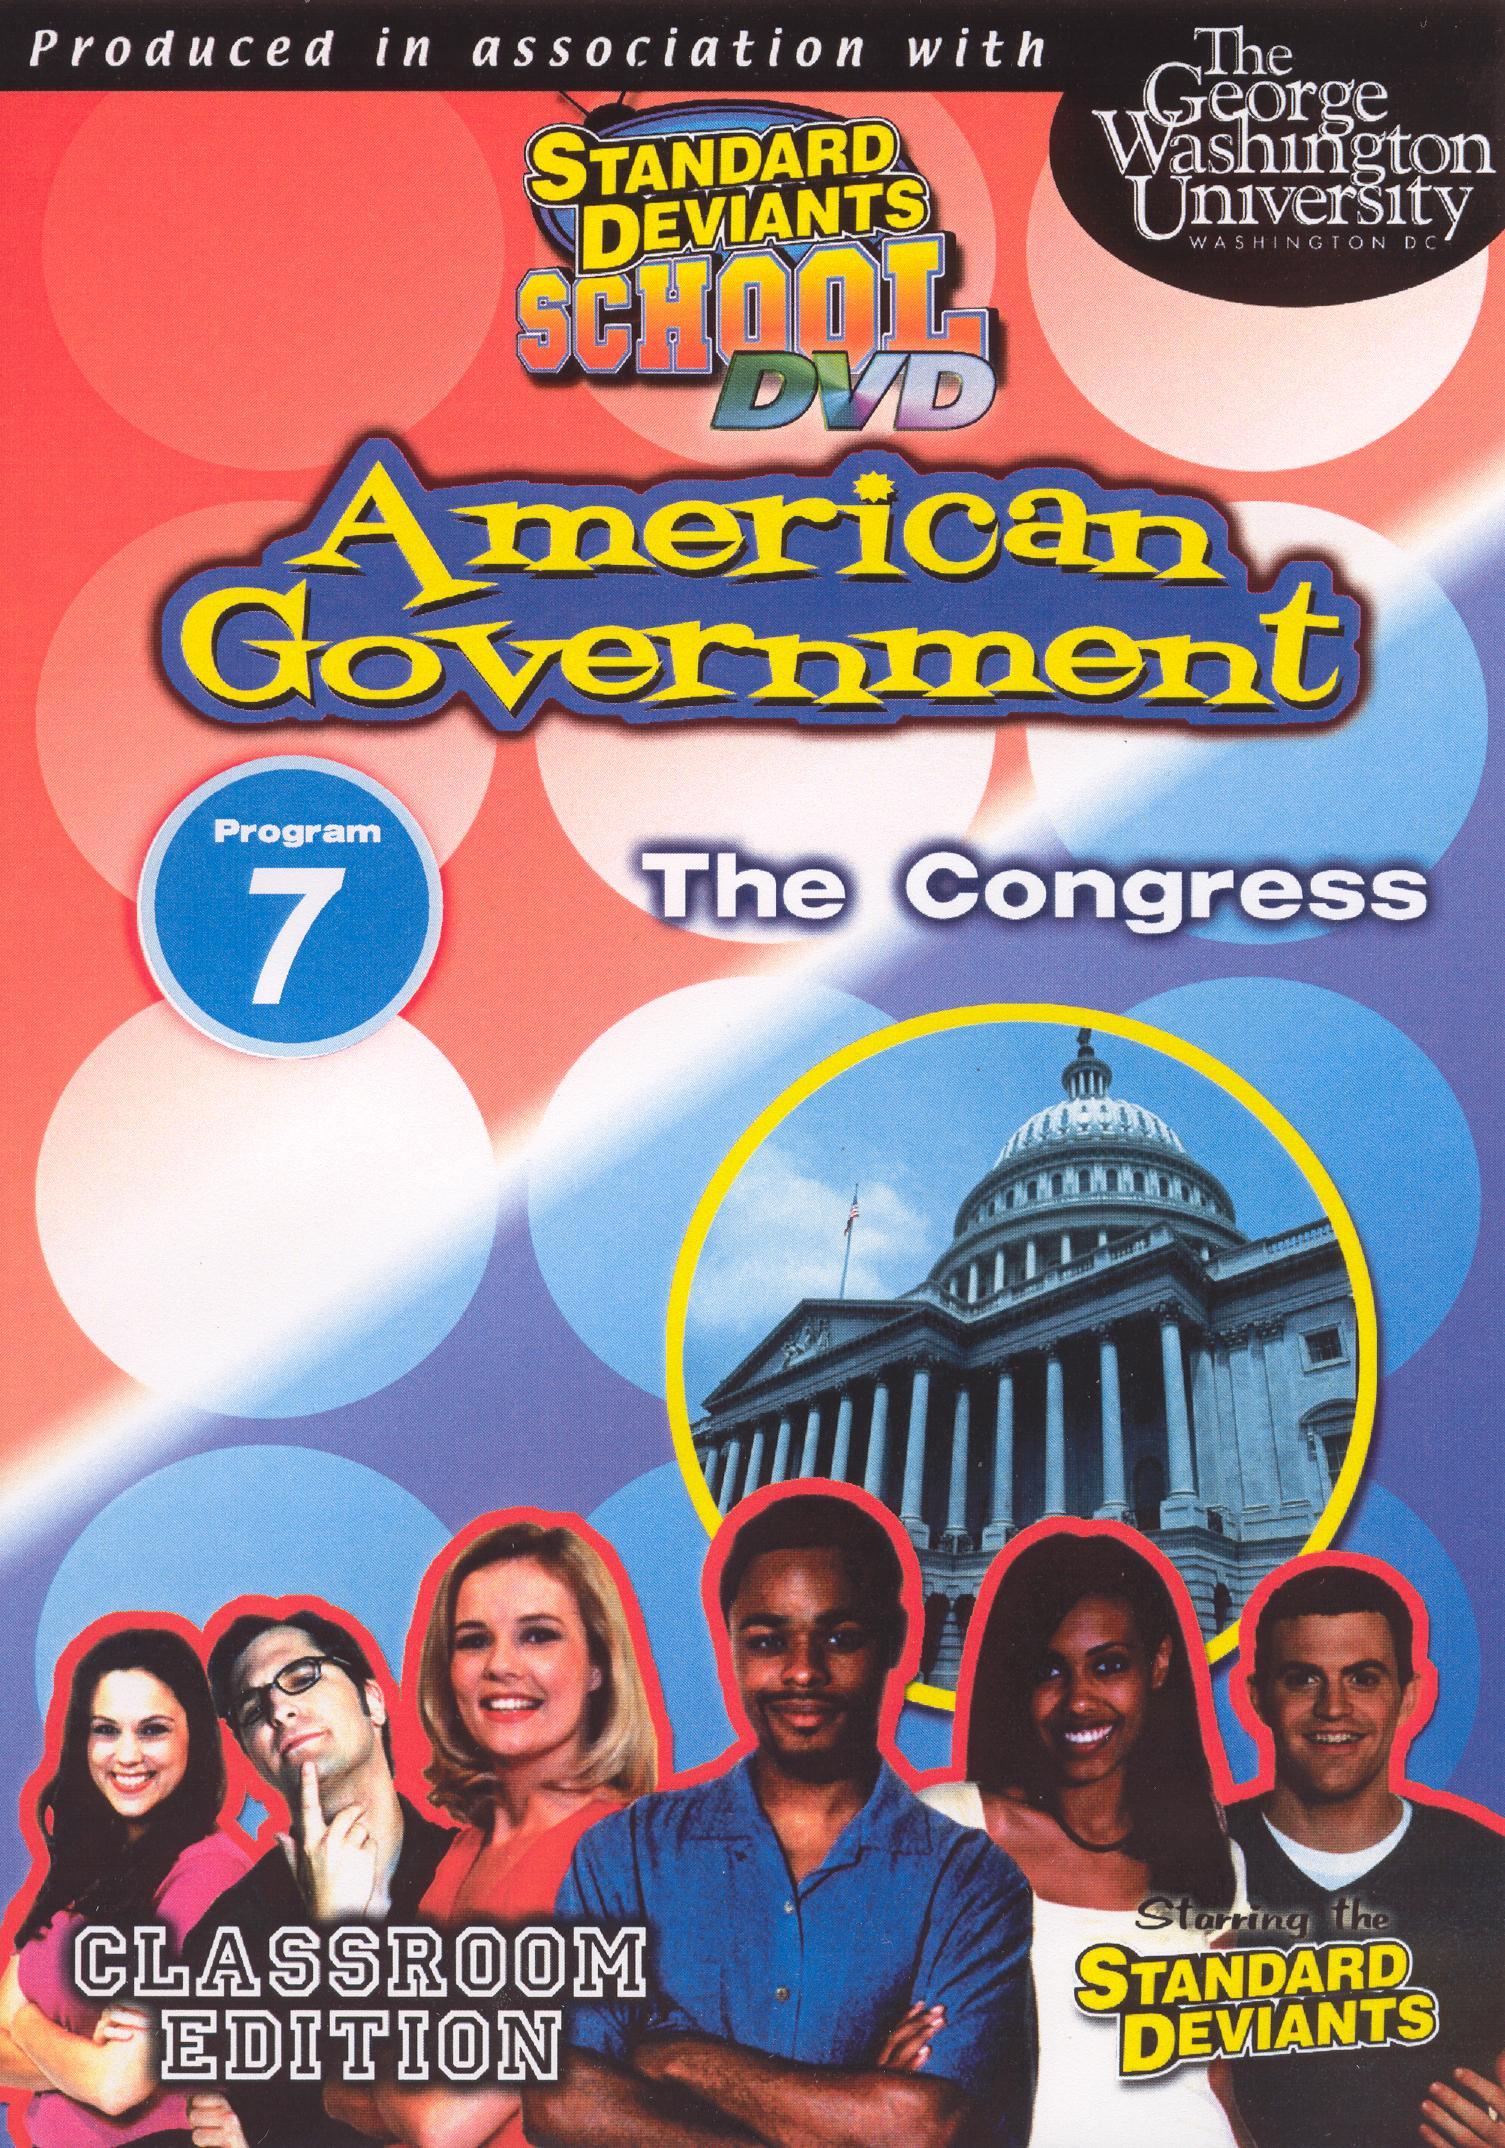 Standard Deviants School: American Government, Module 7 - The Congress